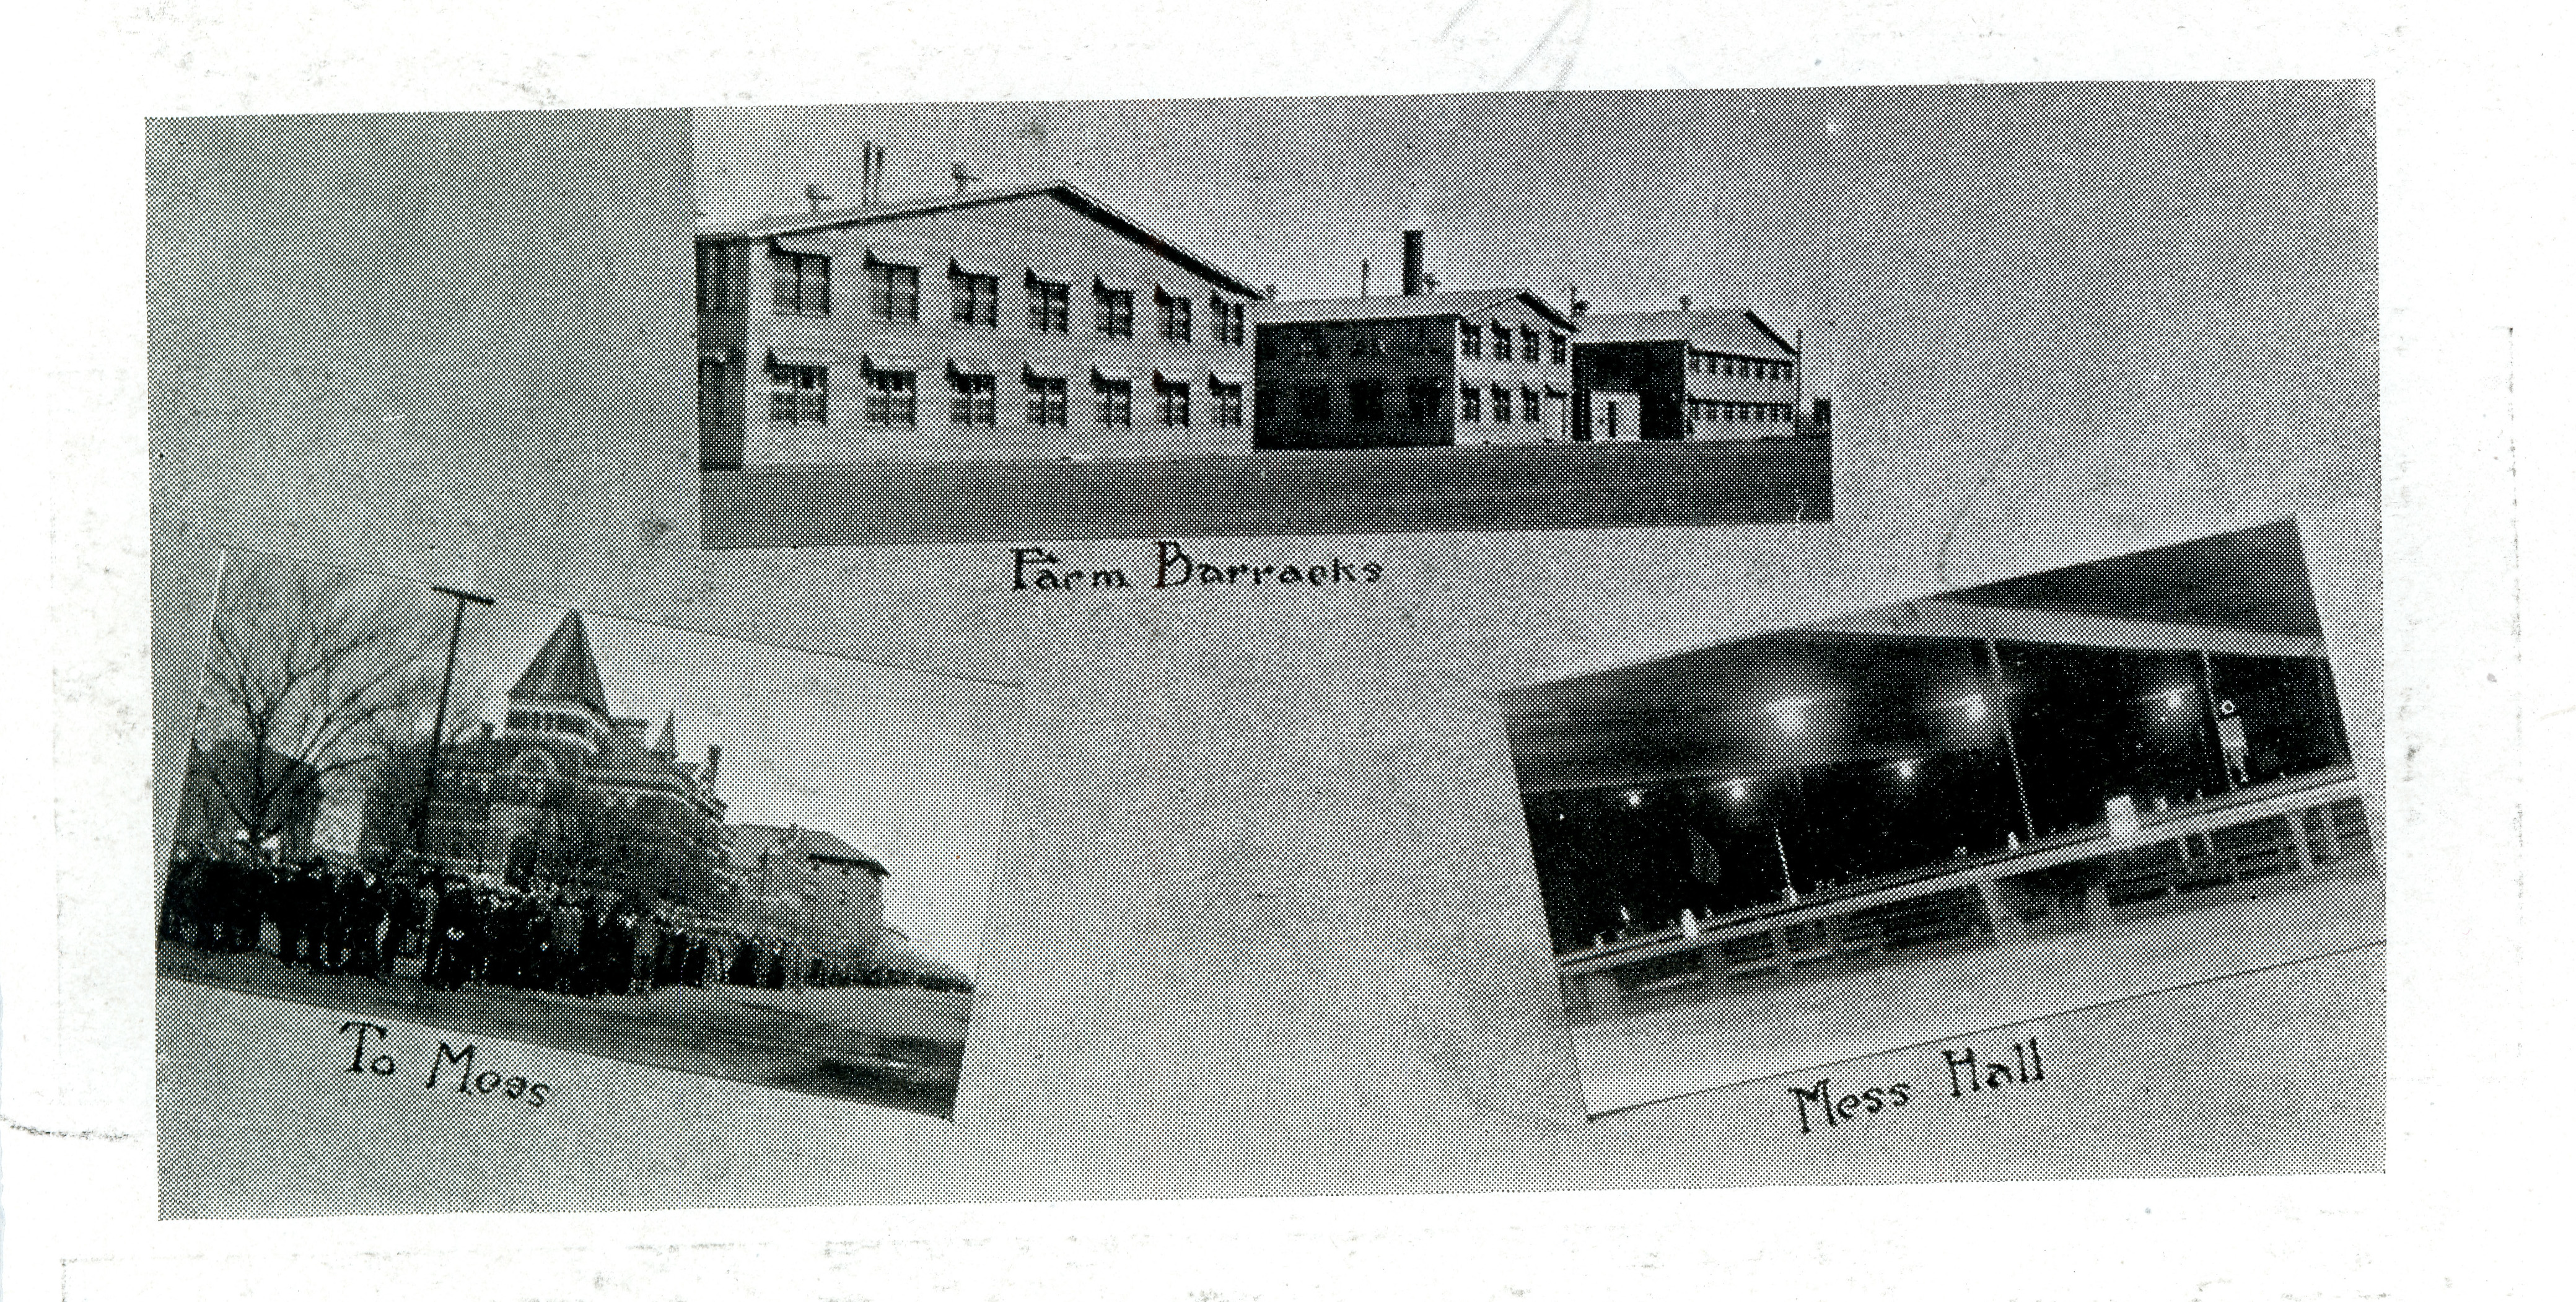 State Farm Barracks